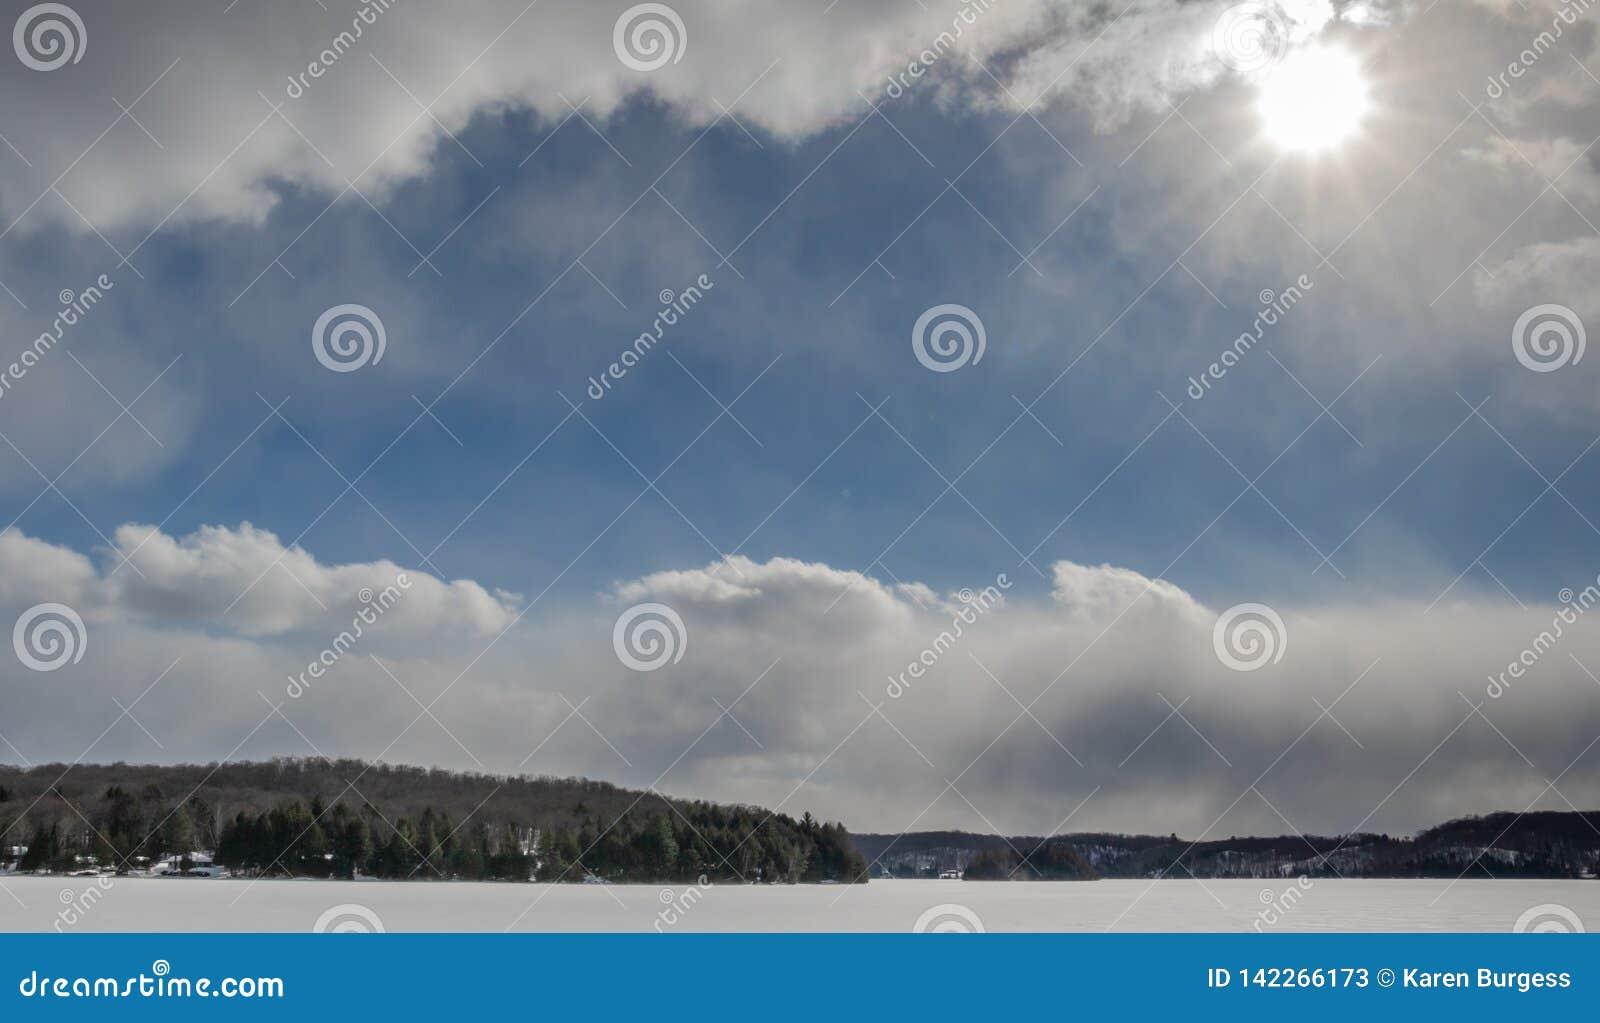 Beautiful blue sky between thick snow clouds in Haliburton Ontario